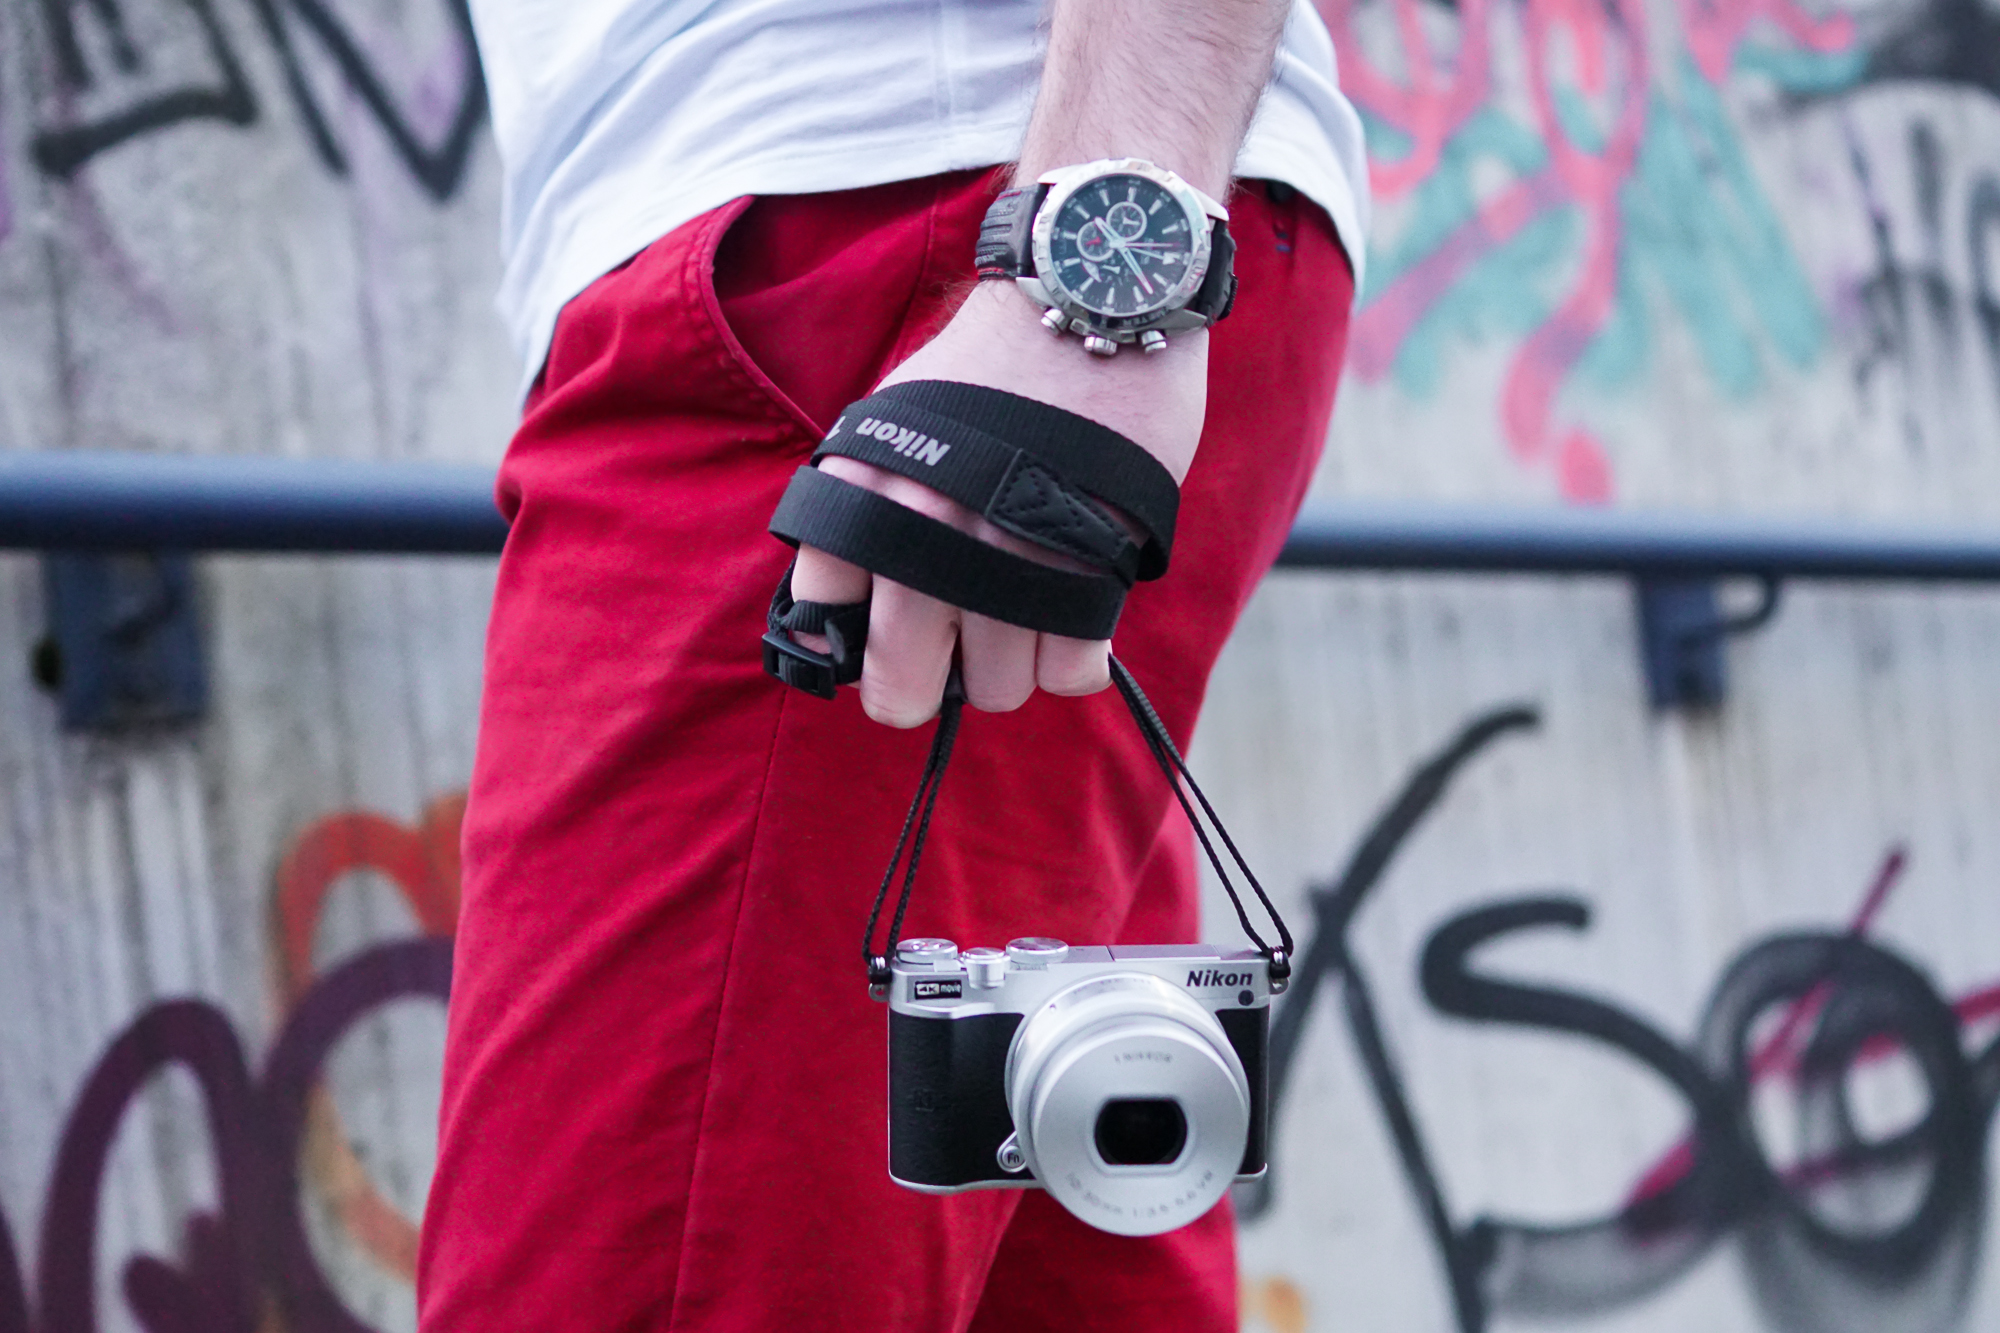 Petr-Vocelka-Nikon-1-J5-7